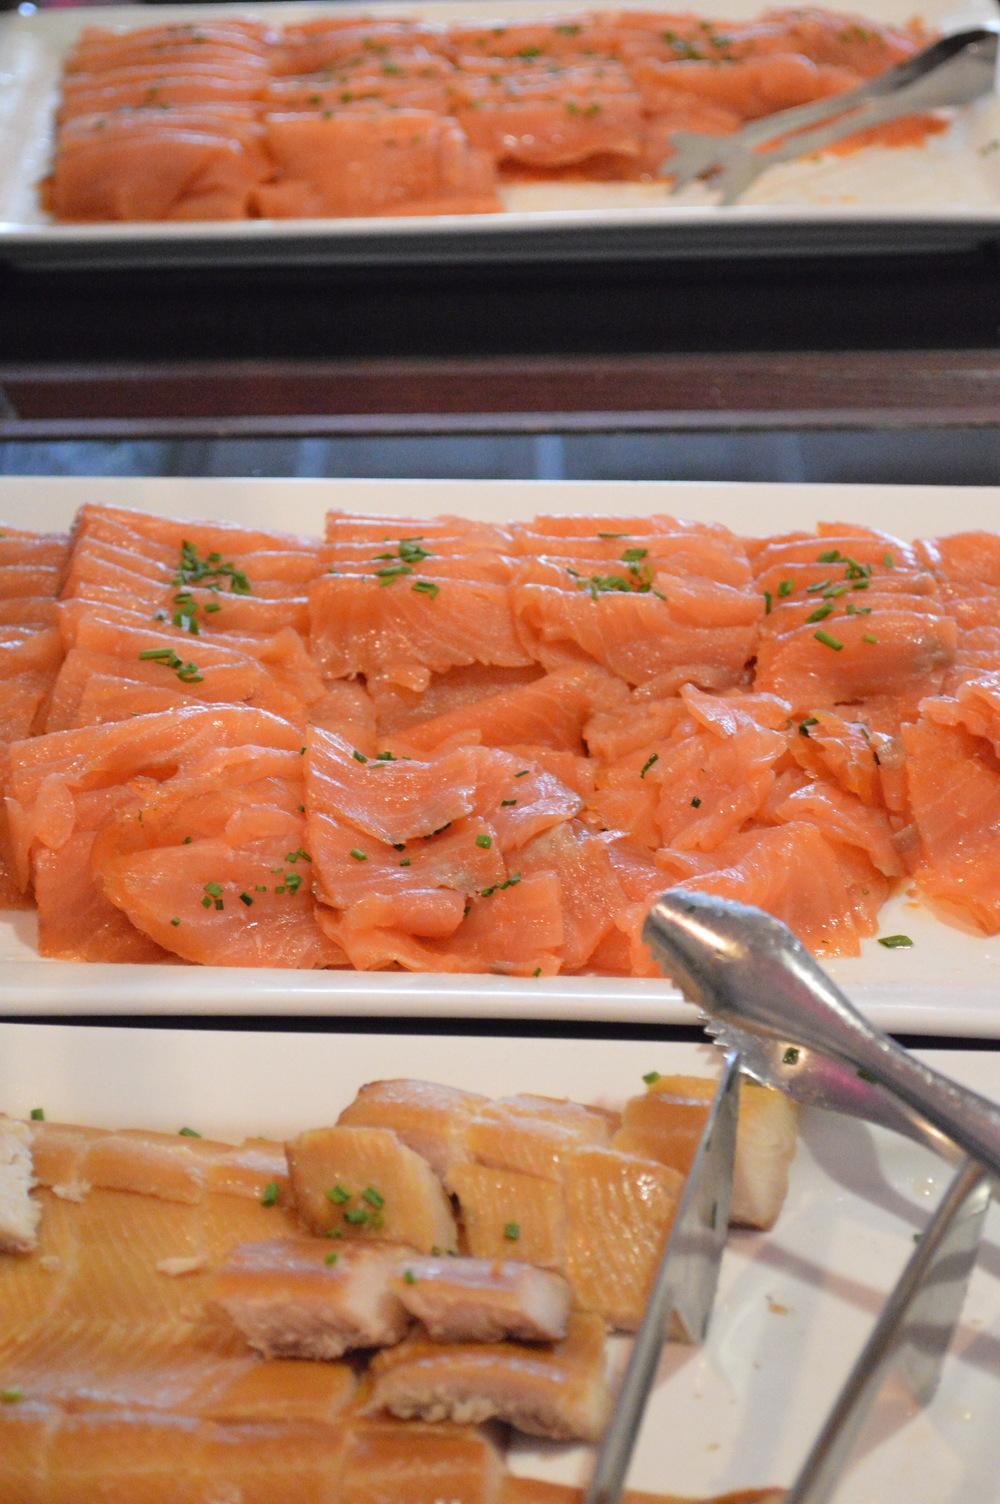 LaurenSchwaiger-Blog-The-Ballantyne-Hotel-Brunch-Smoked-Salmon.jpg